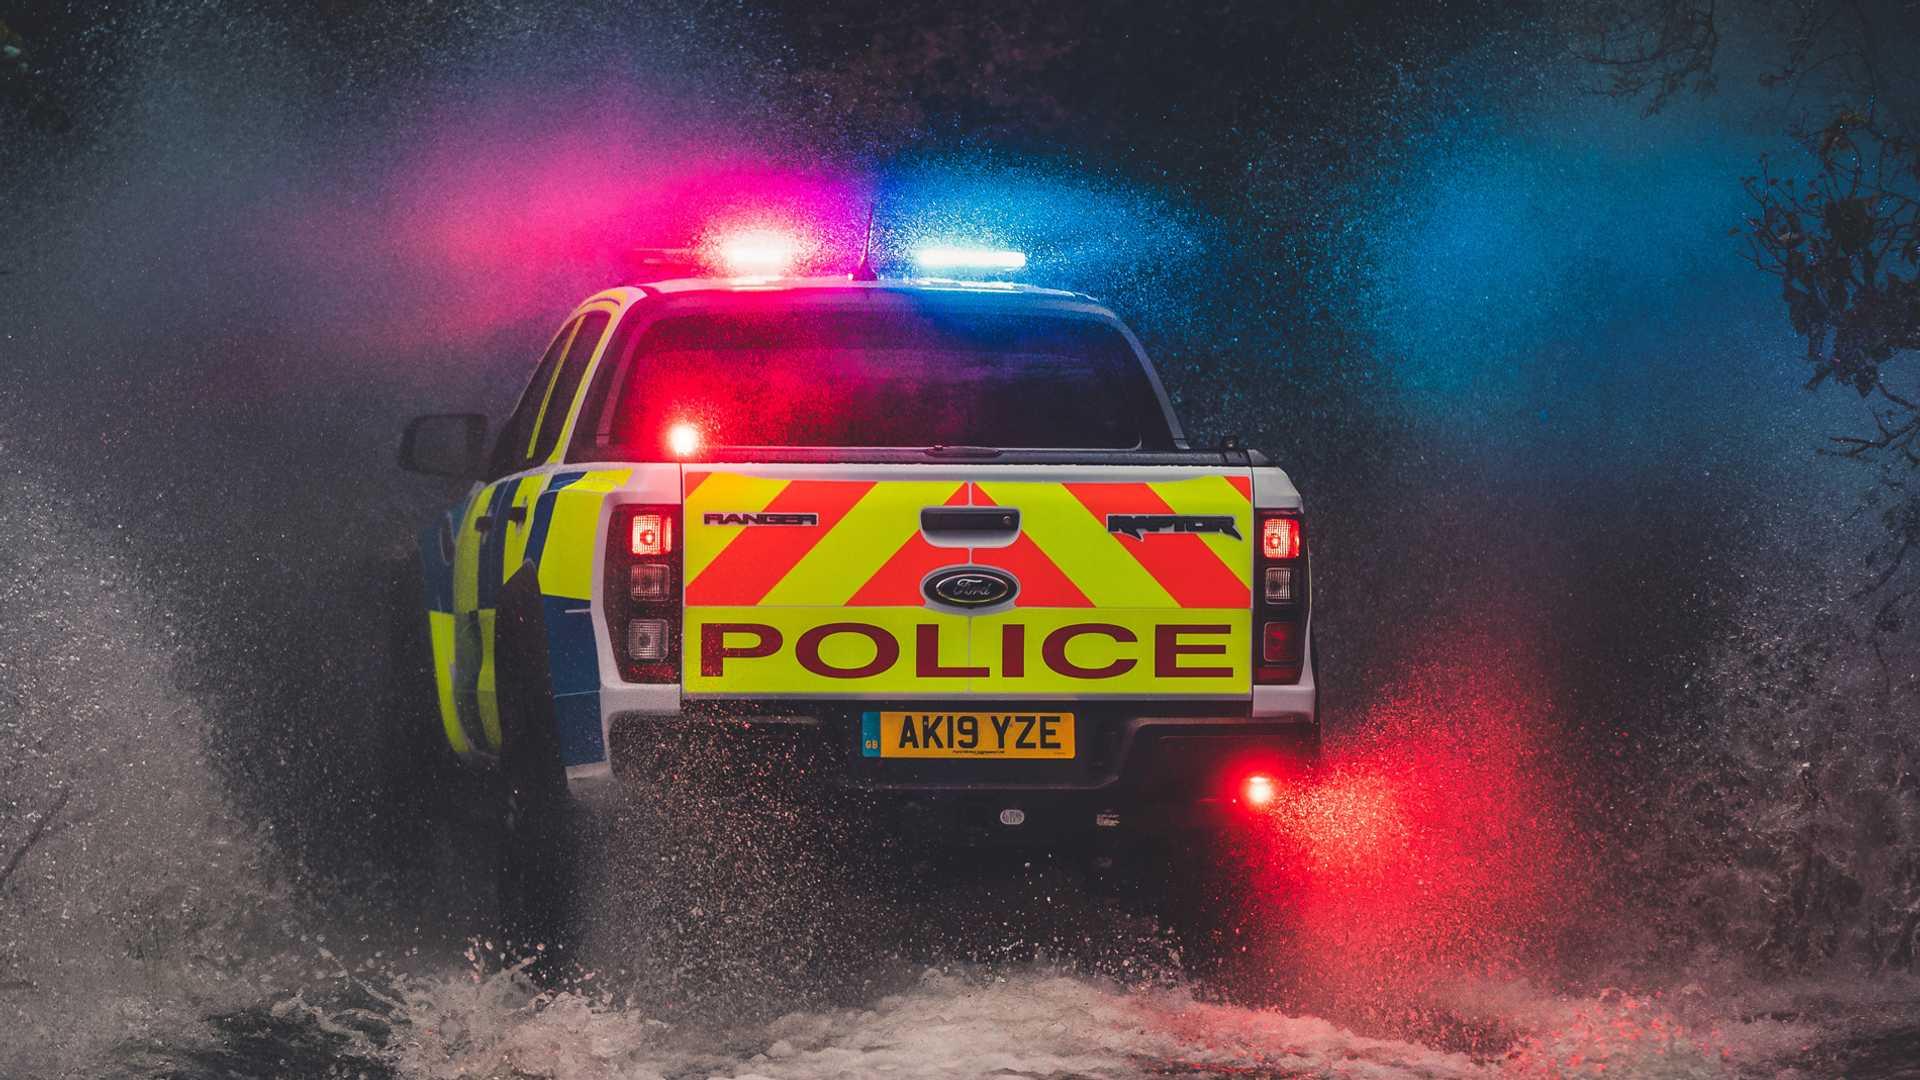 Ford-Focus-ST-and-Ranger-Raptor-UK-police-cars-17